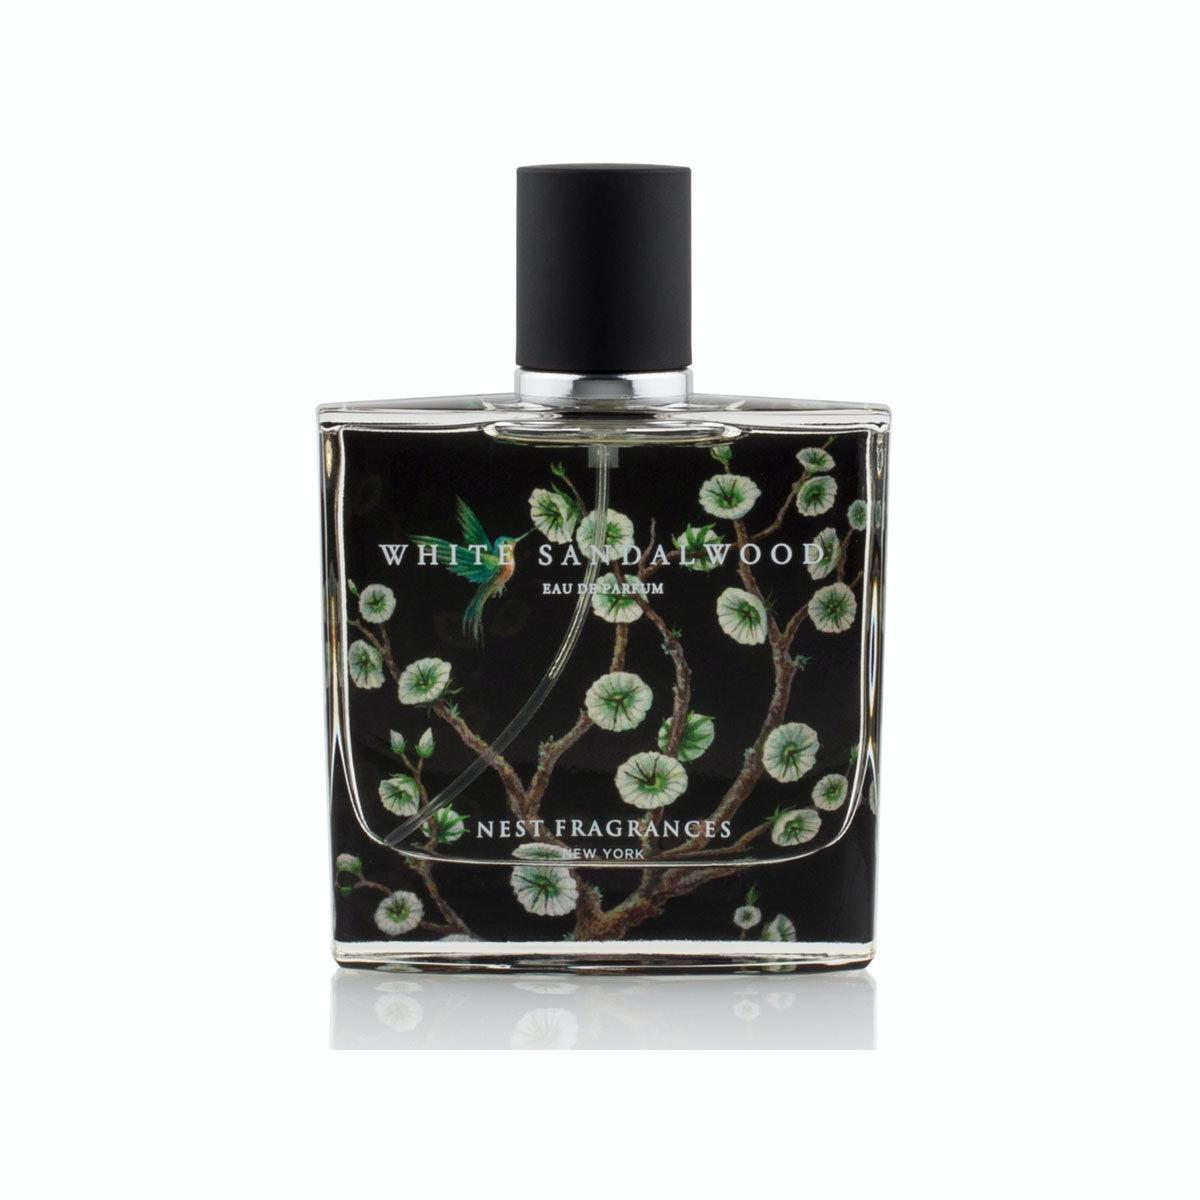 Nest Fragrances White Sandalwood eau de parfum spray, $65, [sephora.com](http://rstyle.me/n/buf5h3w3n).